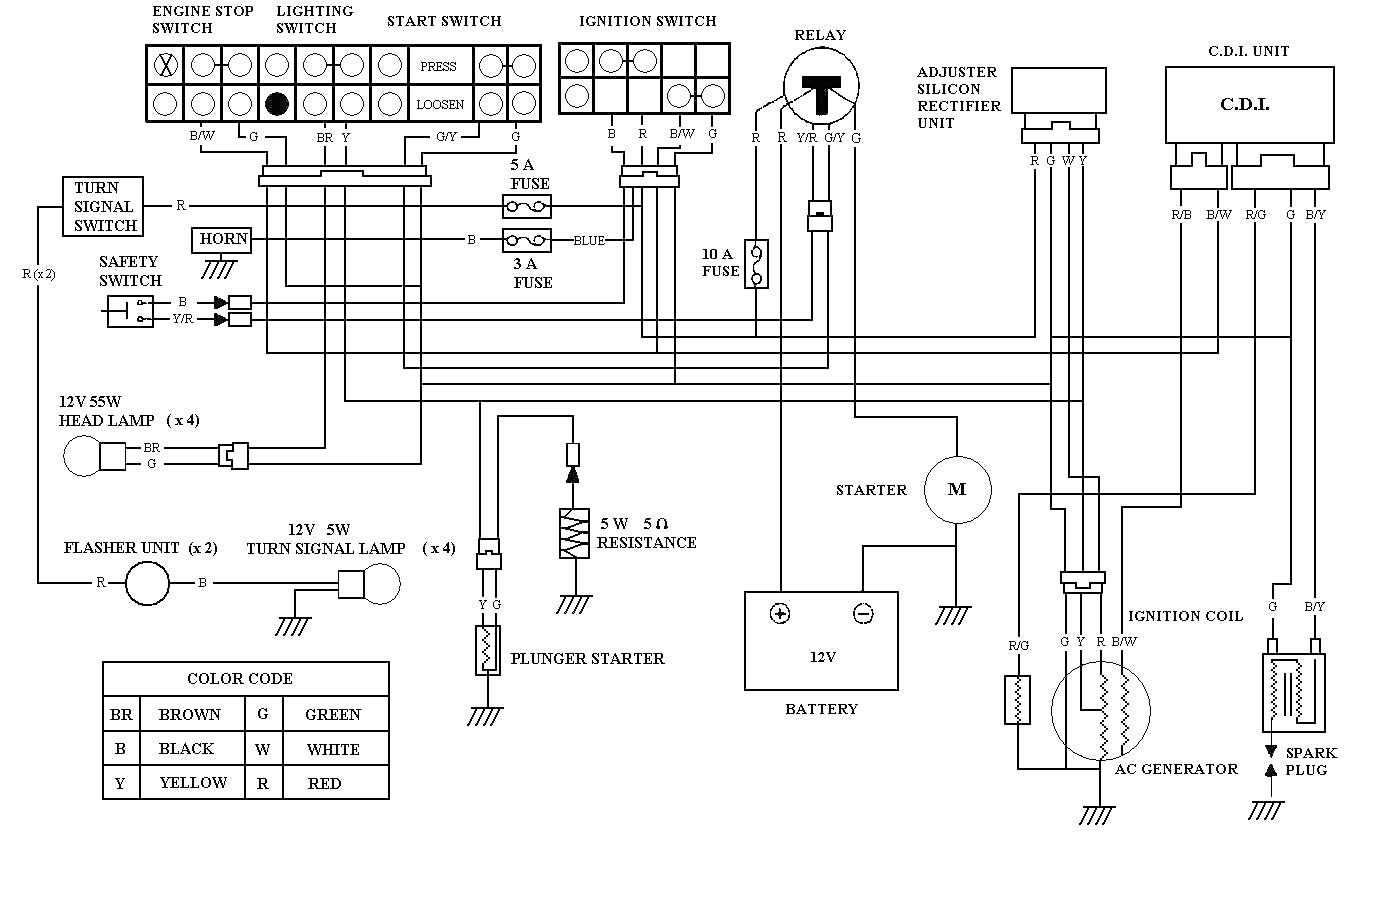 hammerhead wiring diagram schematic wiring diagram Aircraft Wiring Diagrams